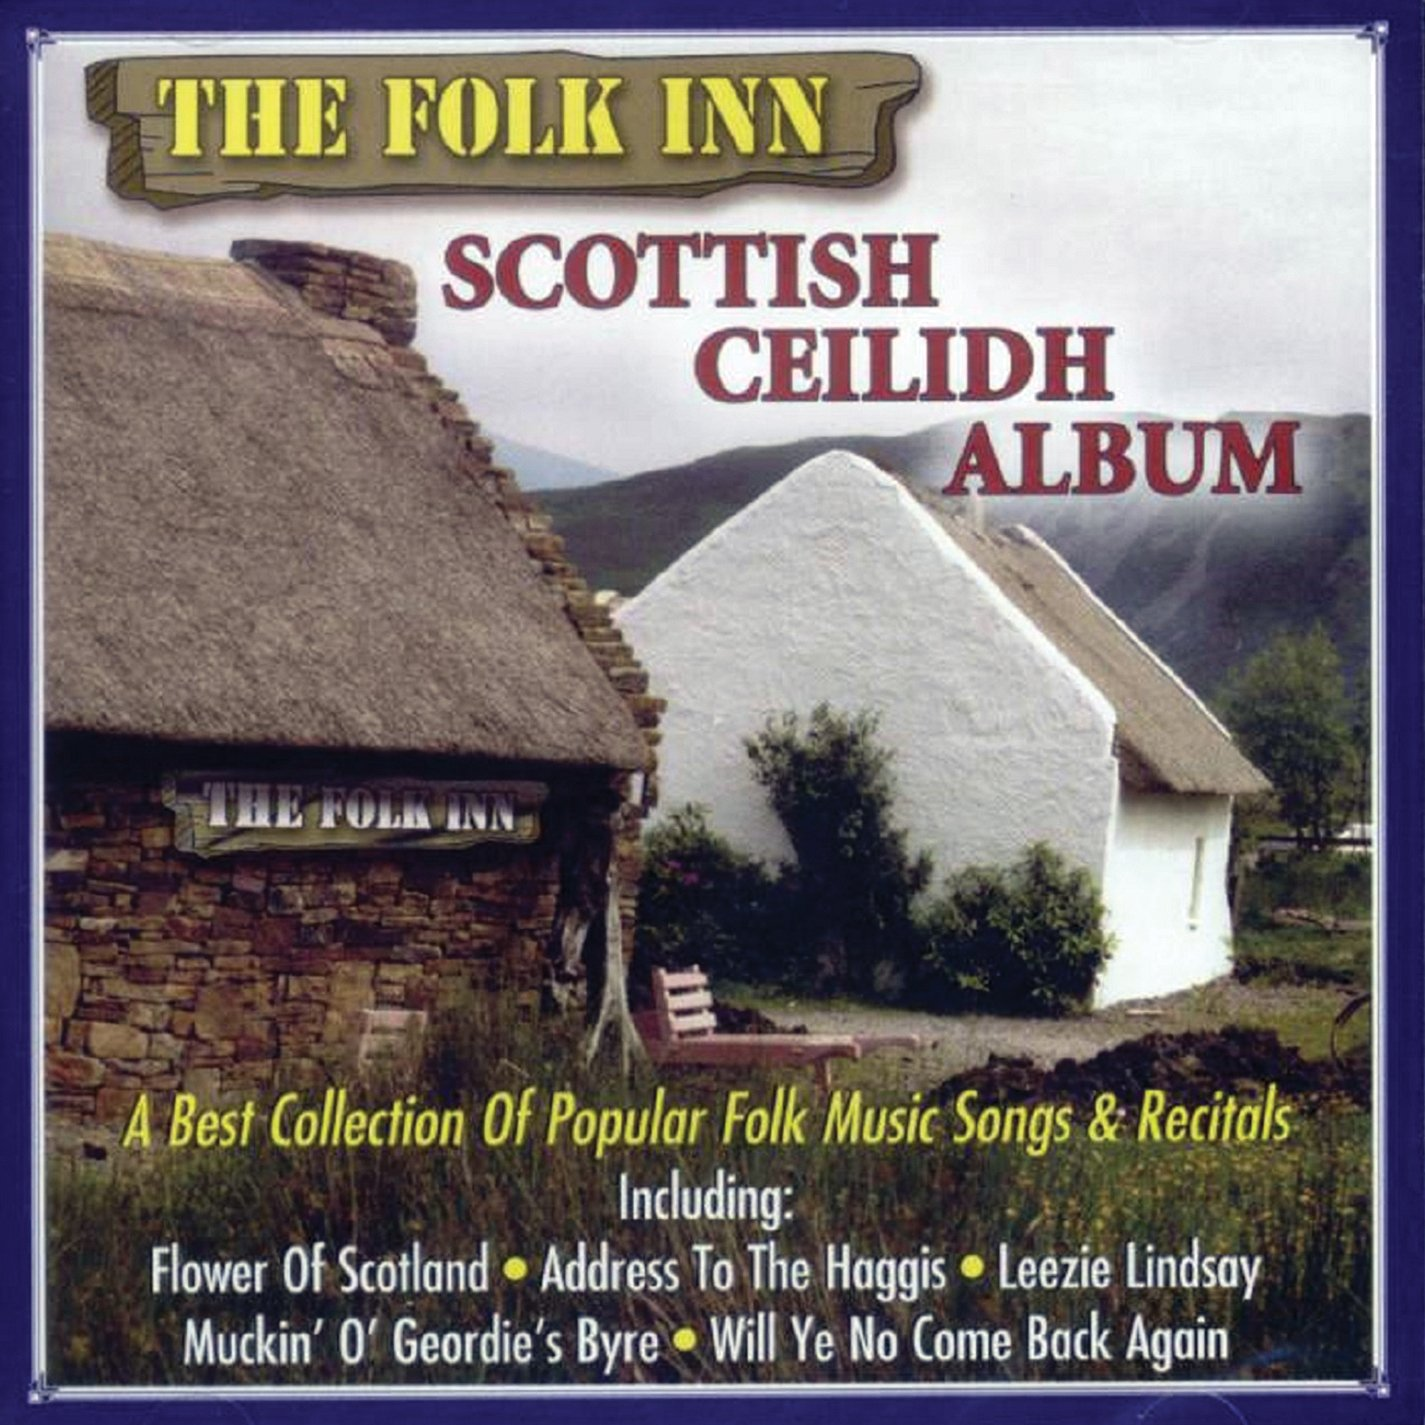 Folk Inn: Scotish Ceilidh Album